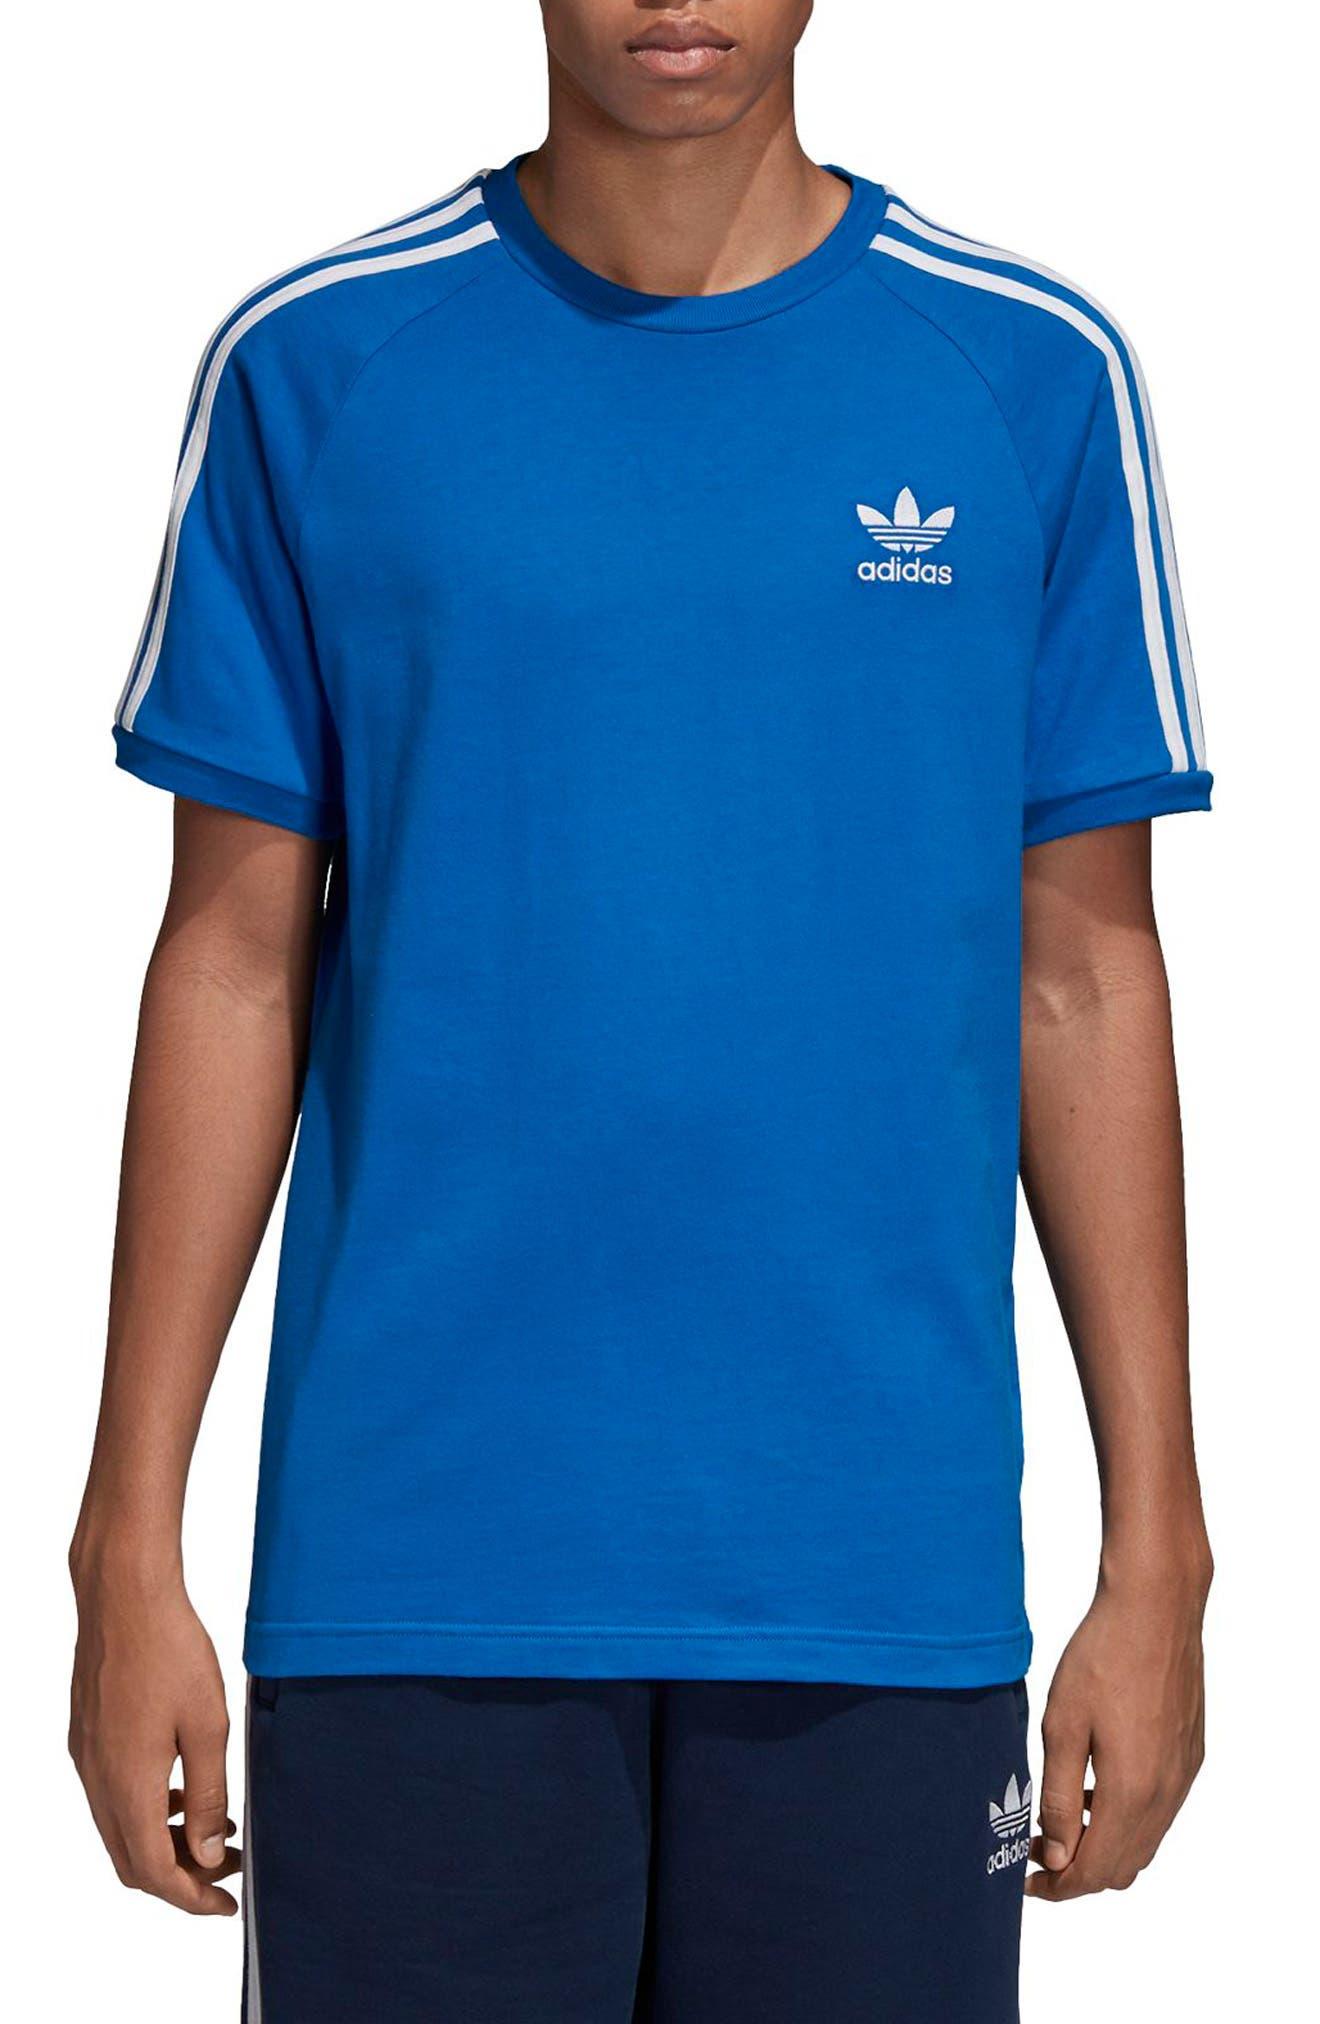 adidas 3-Stripes T-Shirt,                             Main thumbnail 1, color,                             Bluebird